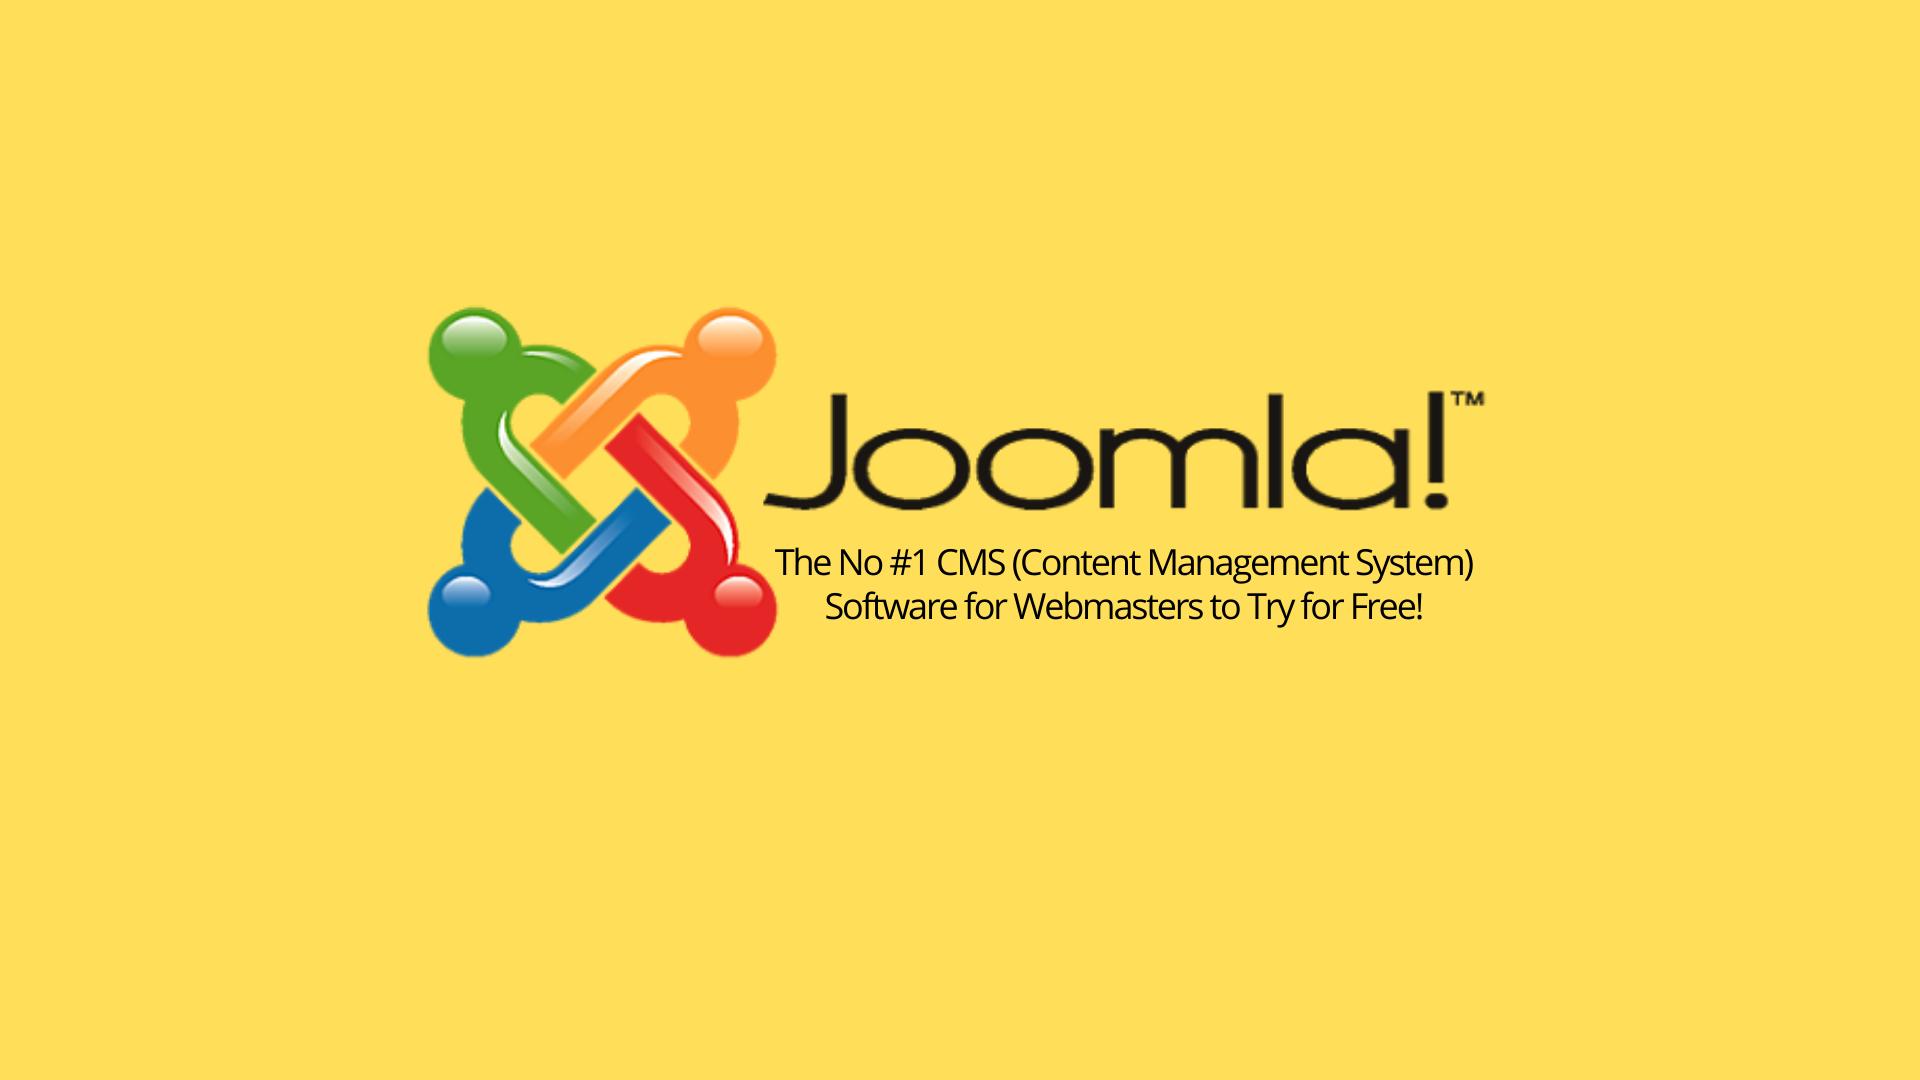 What is Joomla?